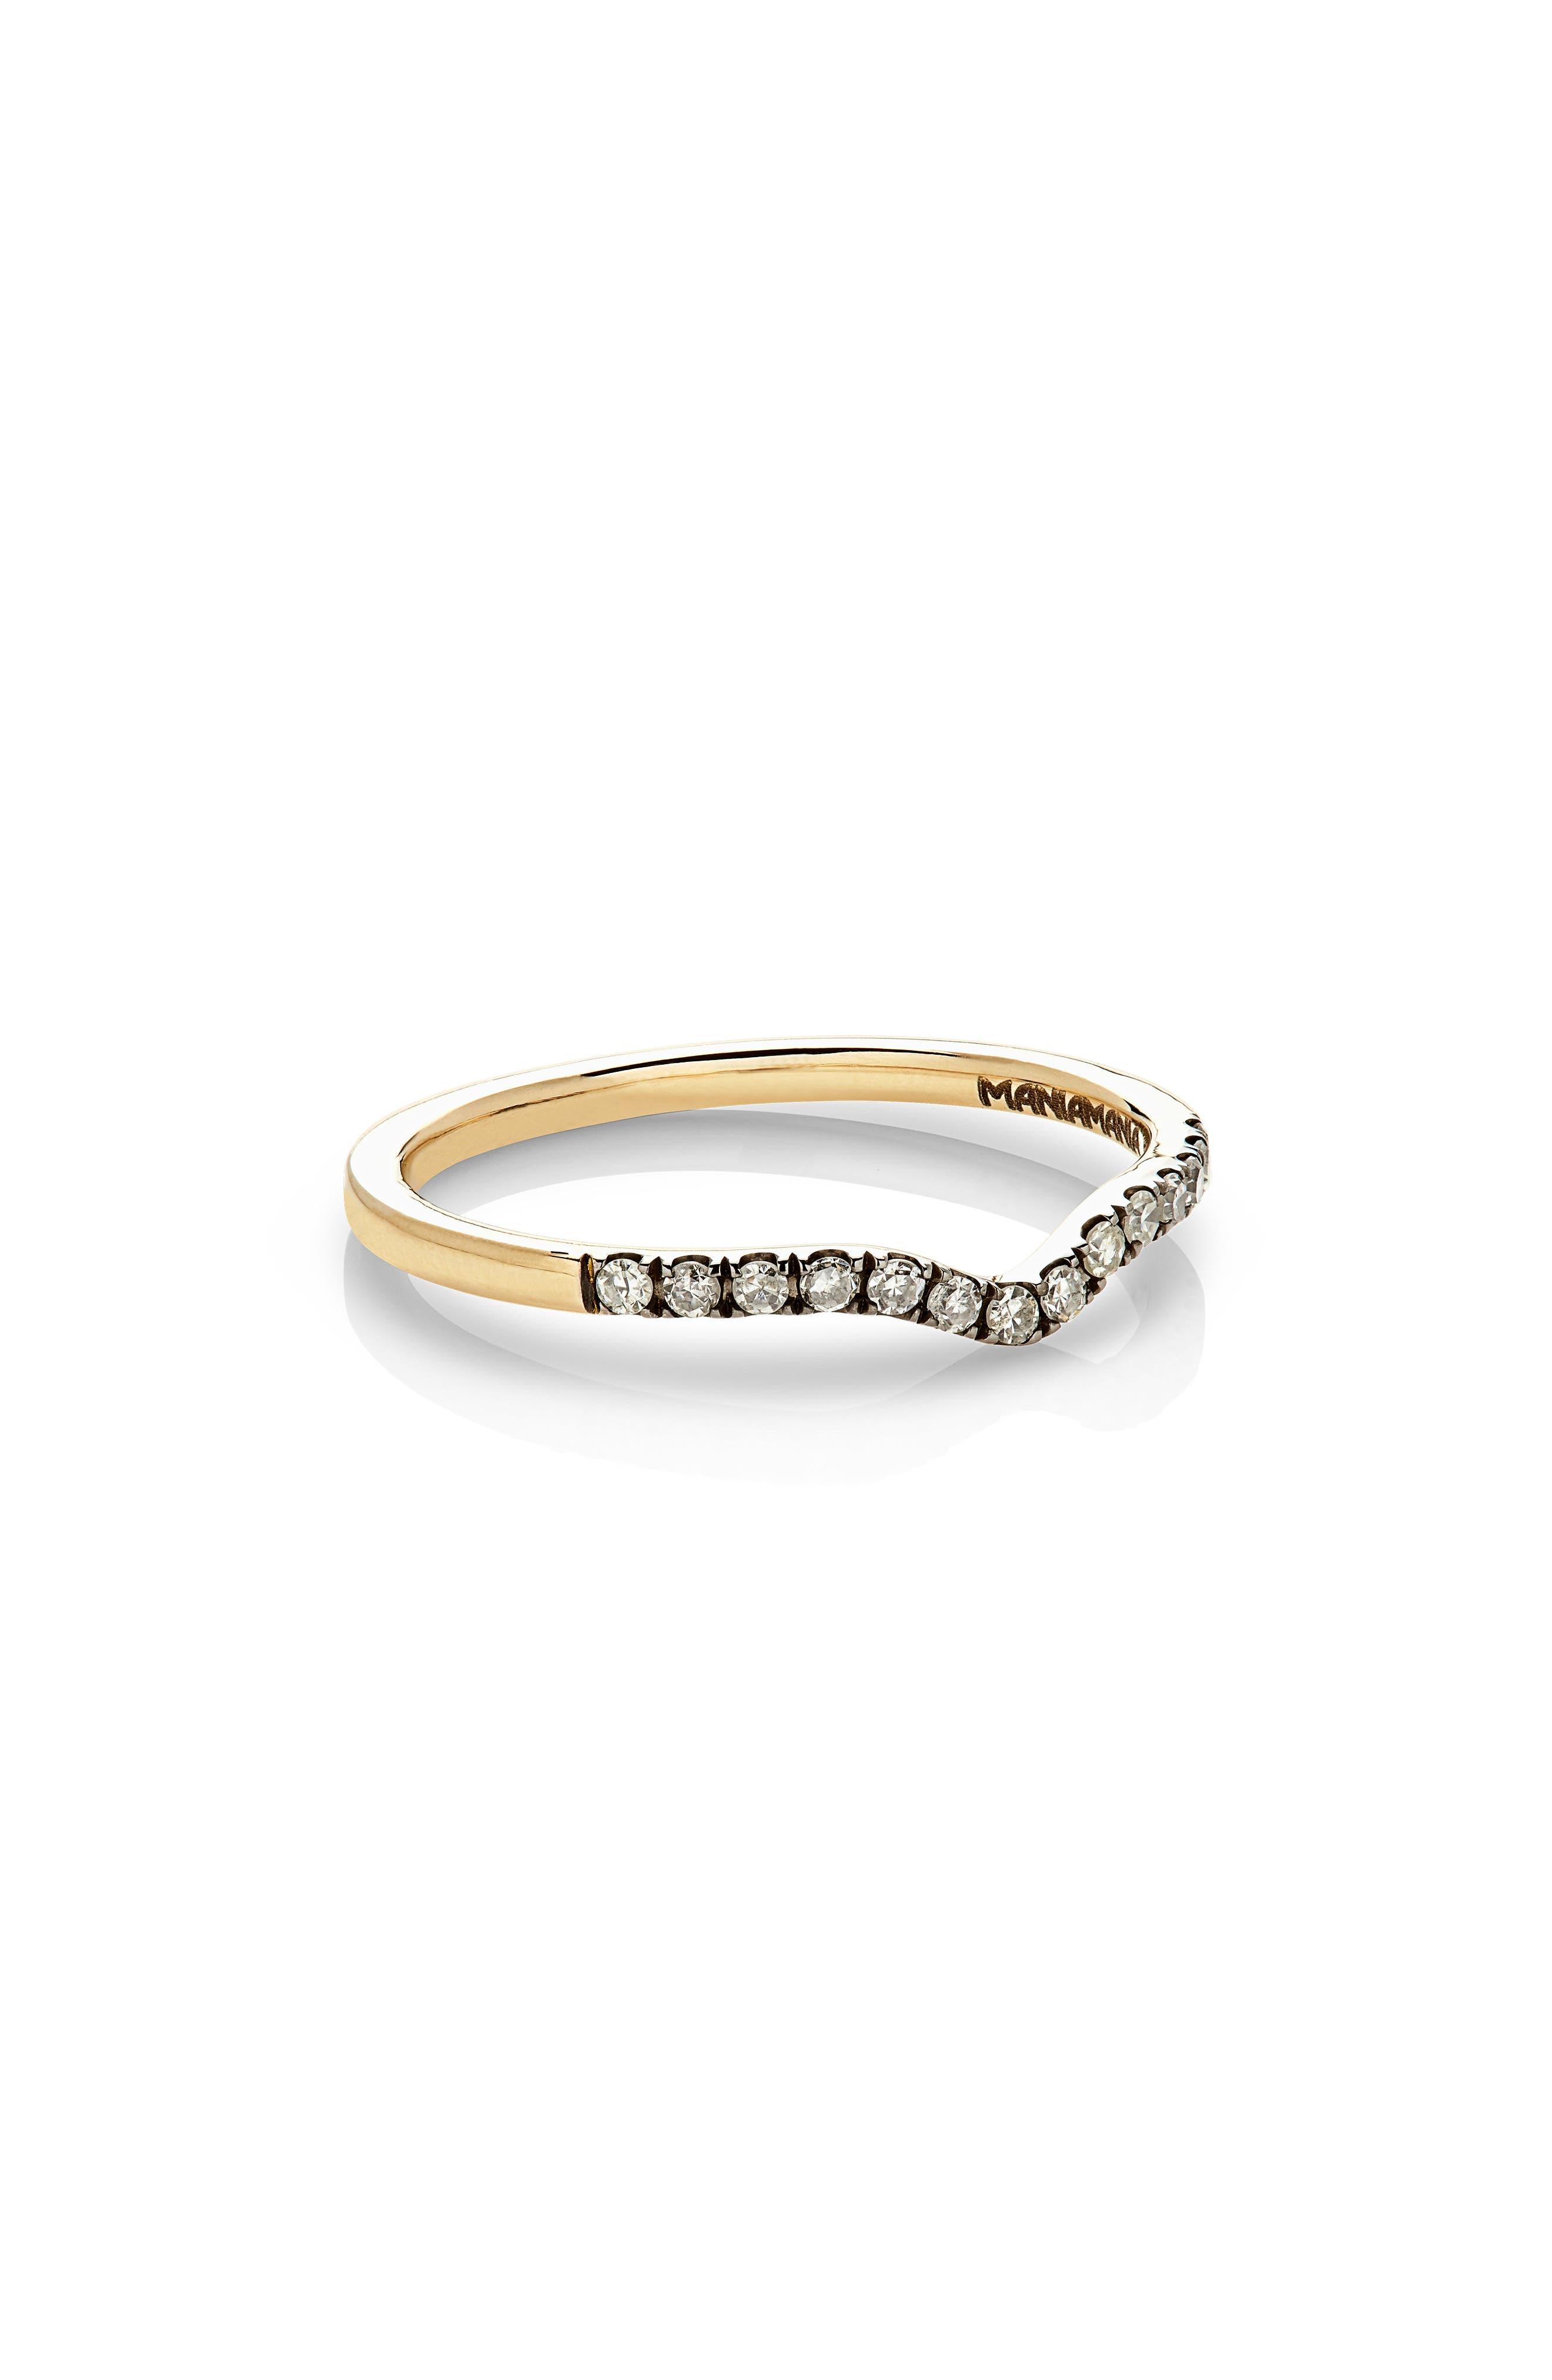 Main Image - Maniamania Unity Diamond Band Ring